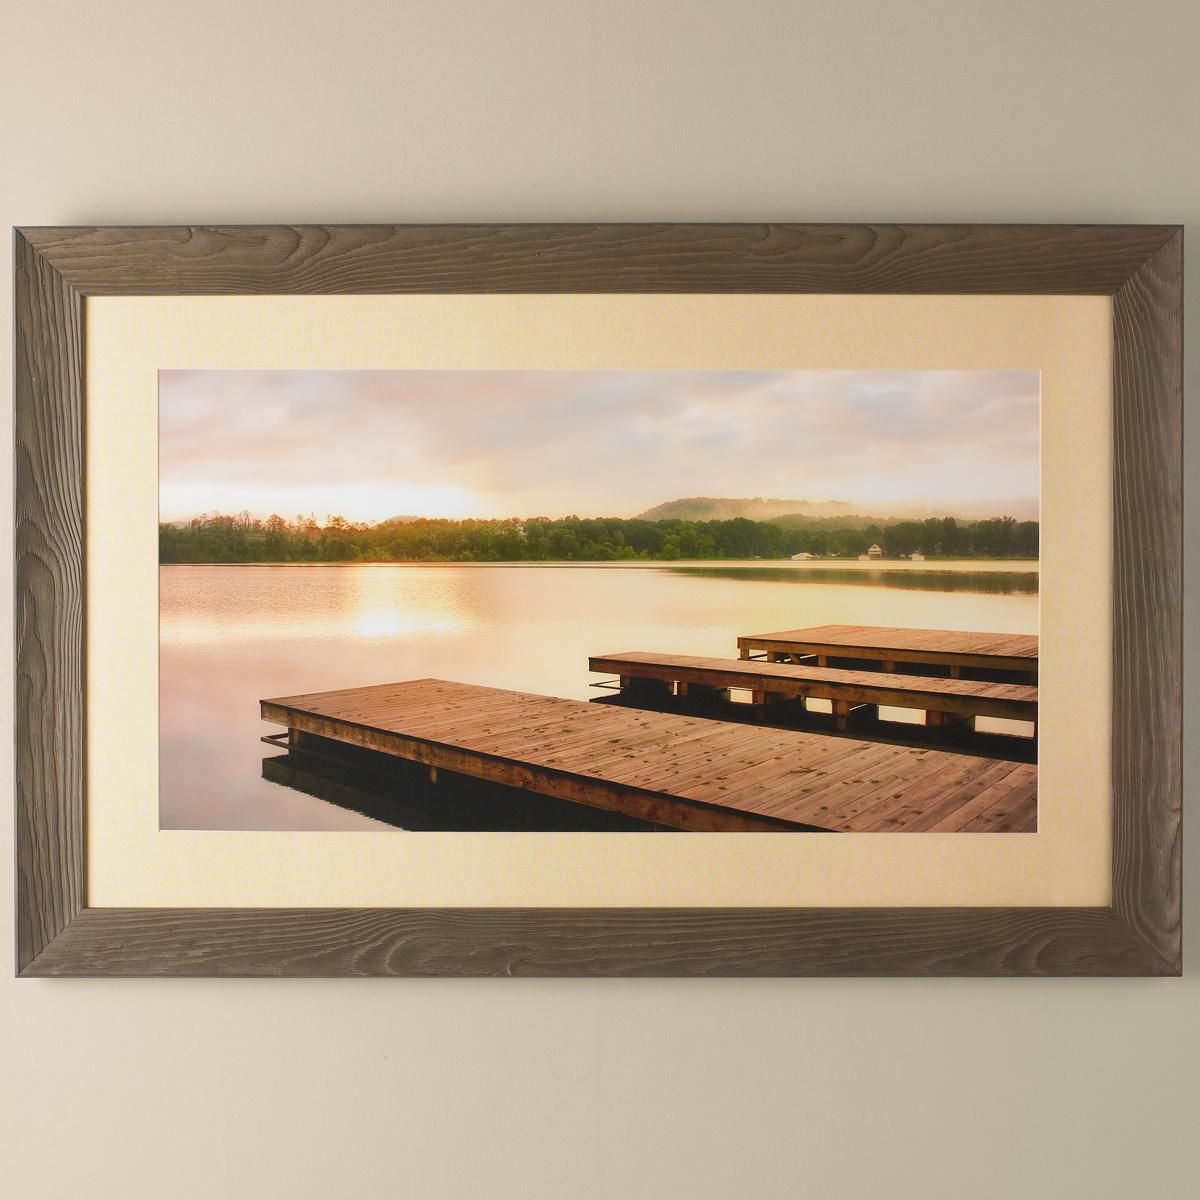 X river docks wood framed wall art this large water scene brings